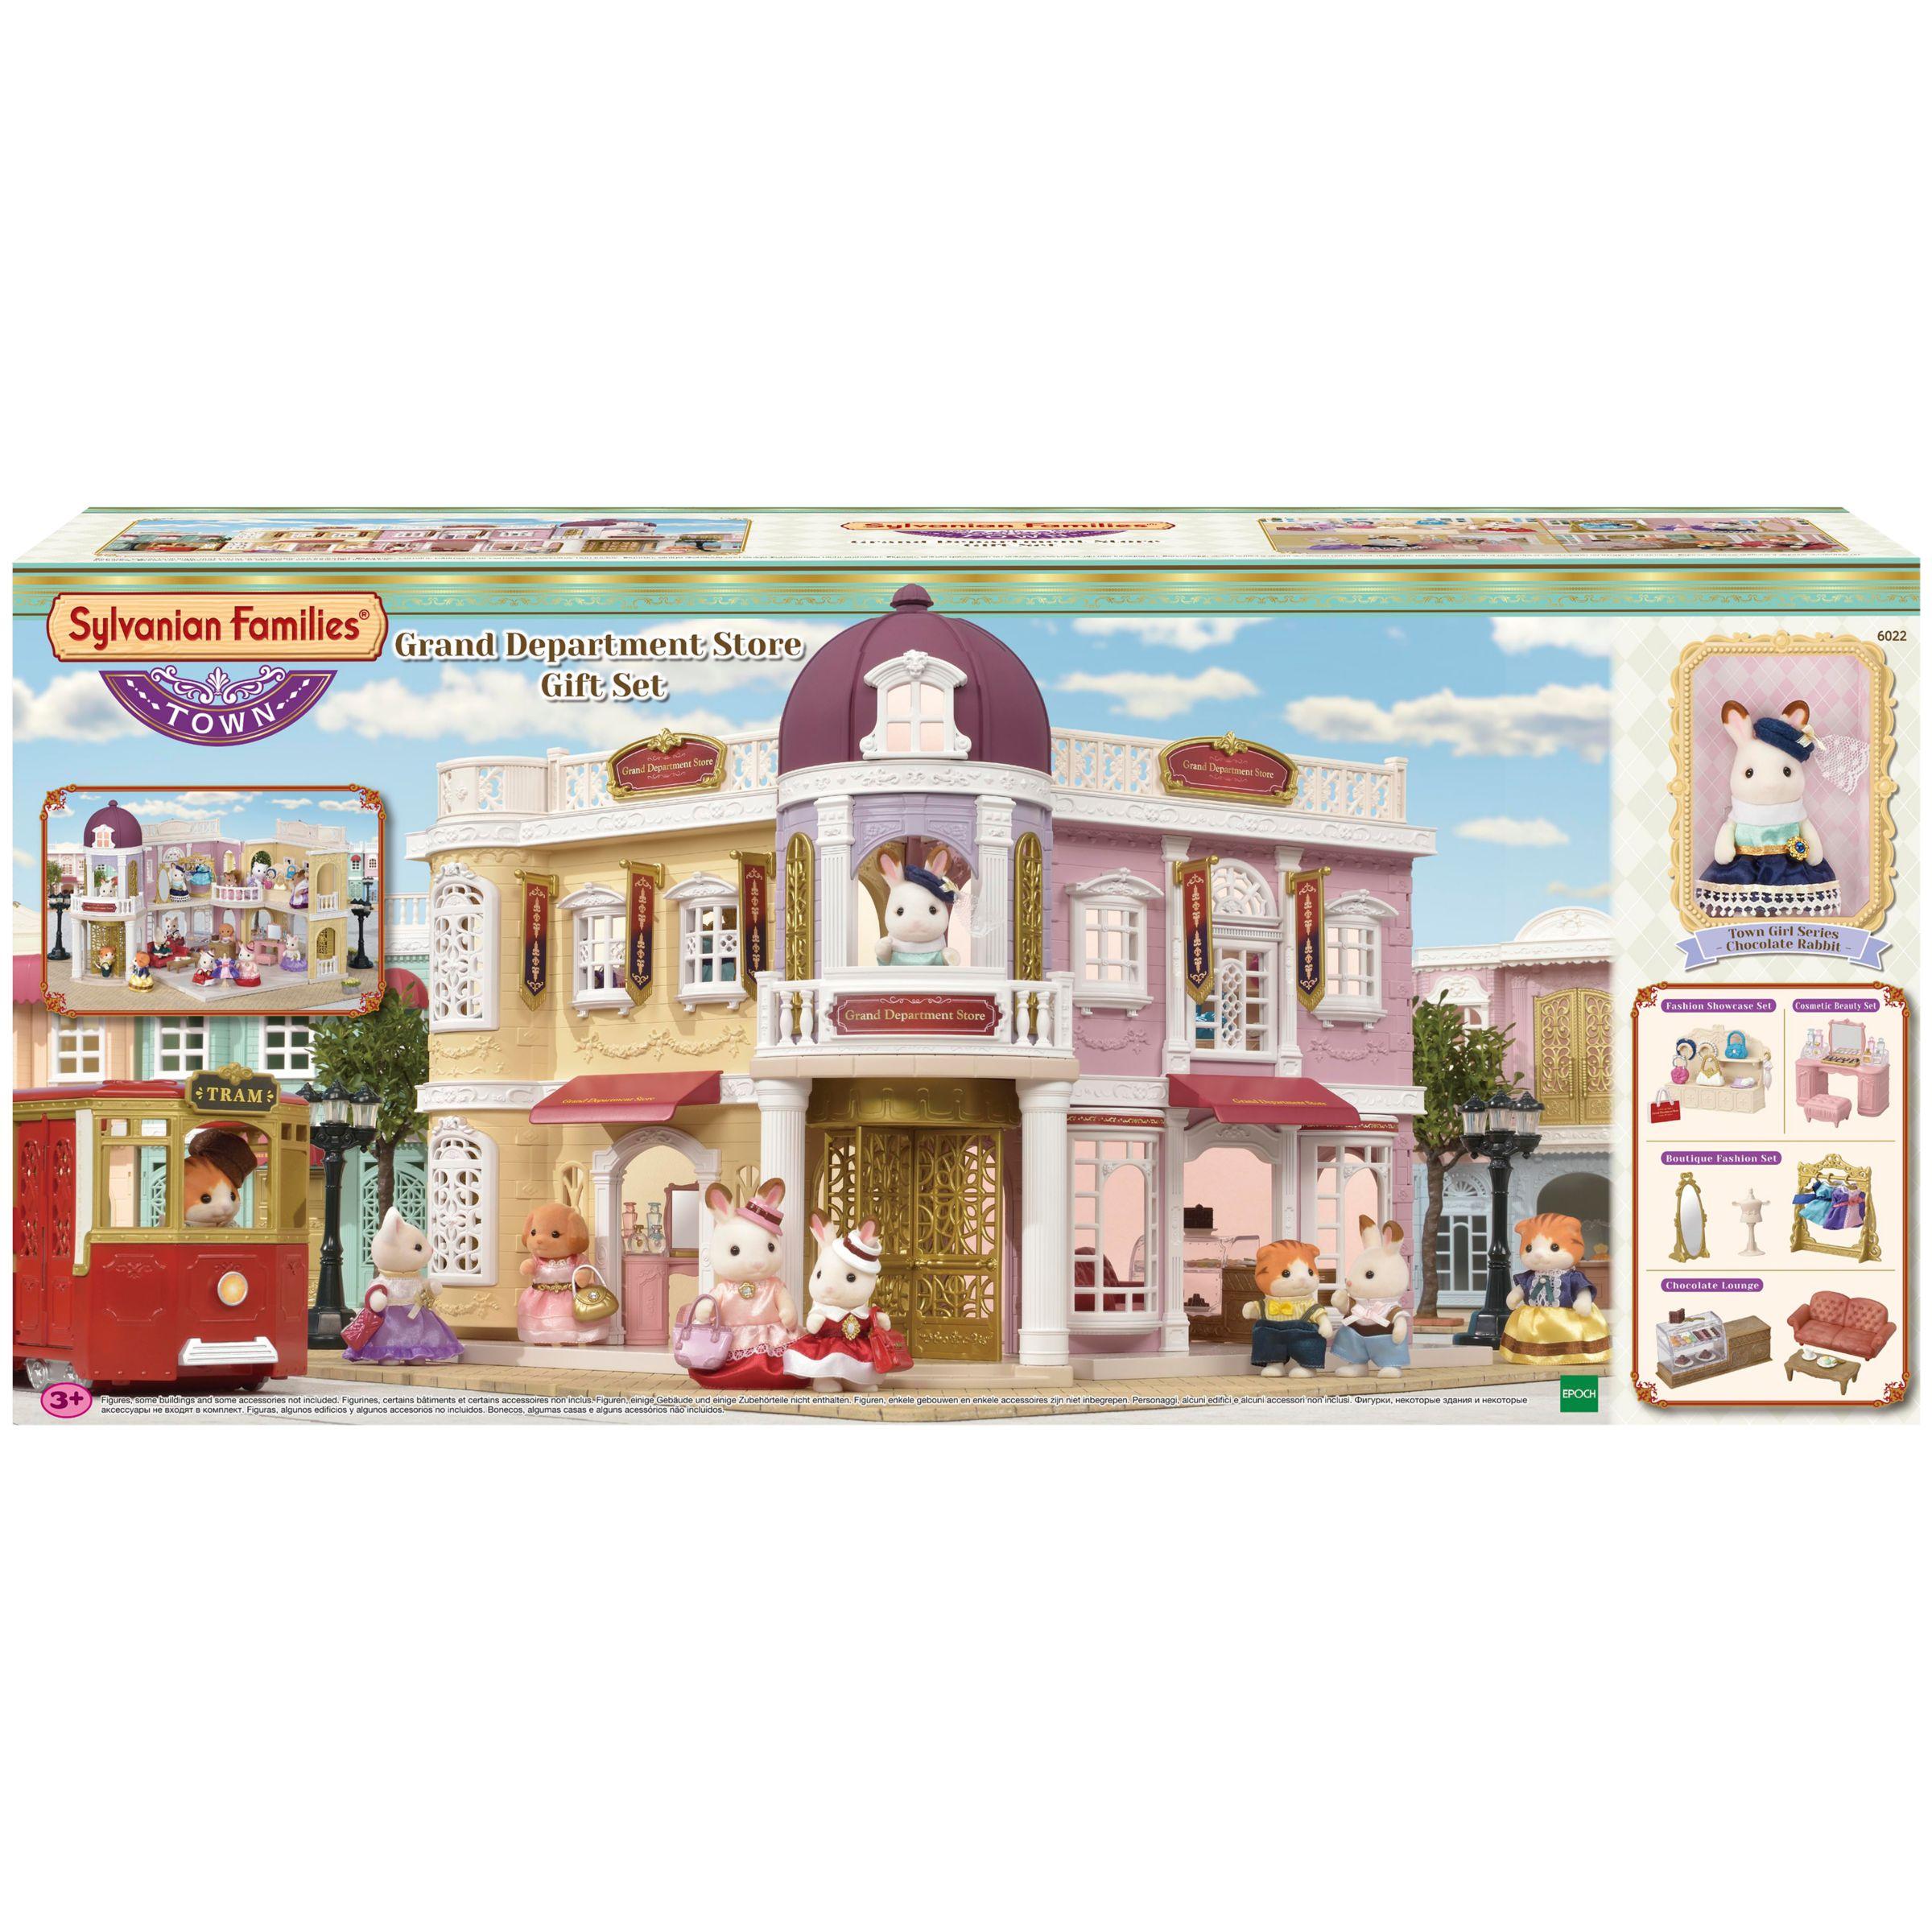 Sylvanian Families Sylvanian Families Town Series Grand Department Store Gift Set